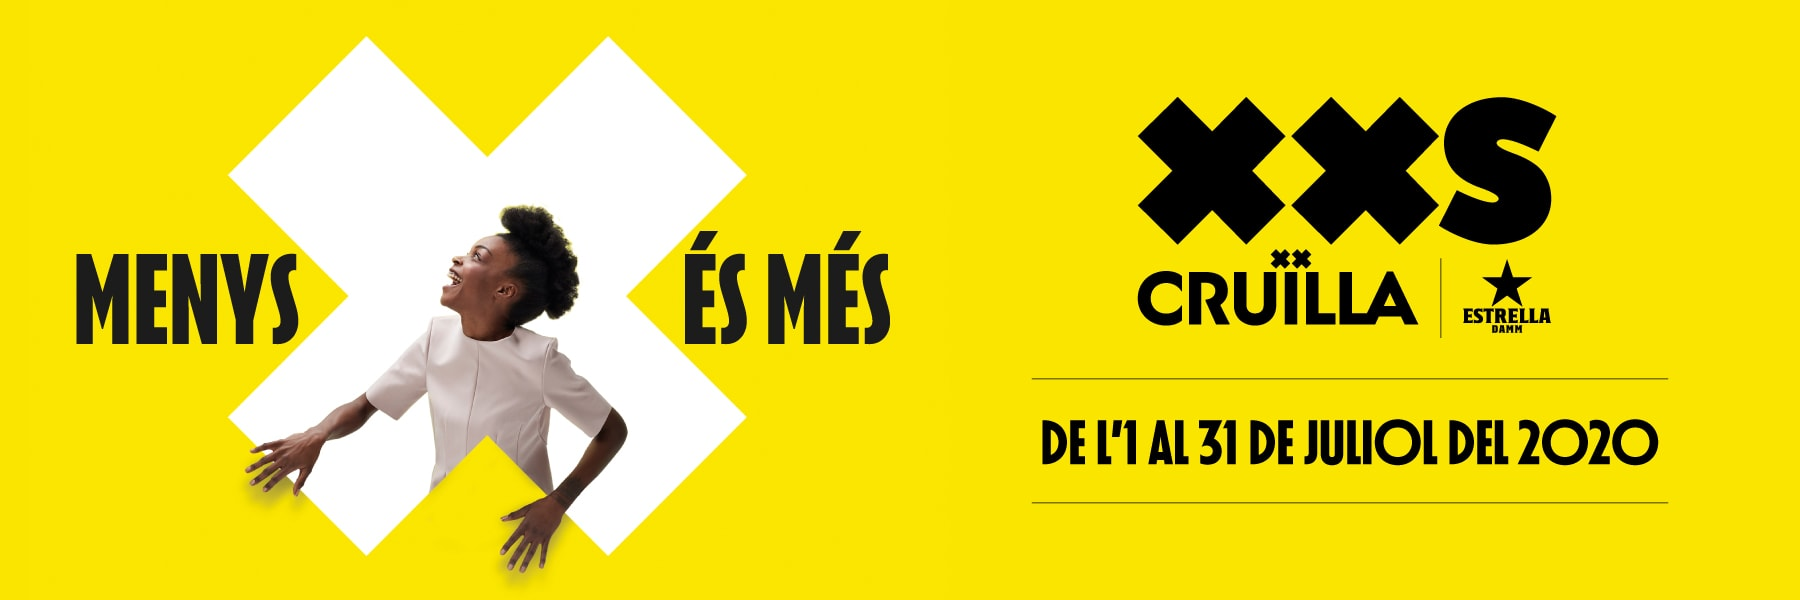 cruïlla xxs